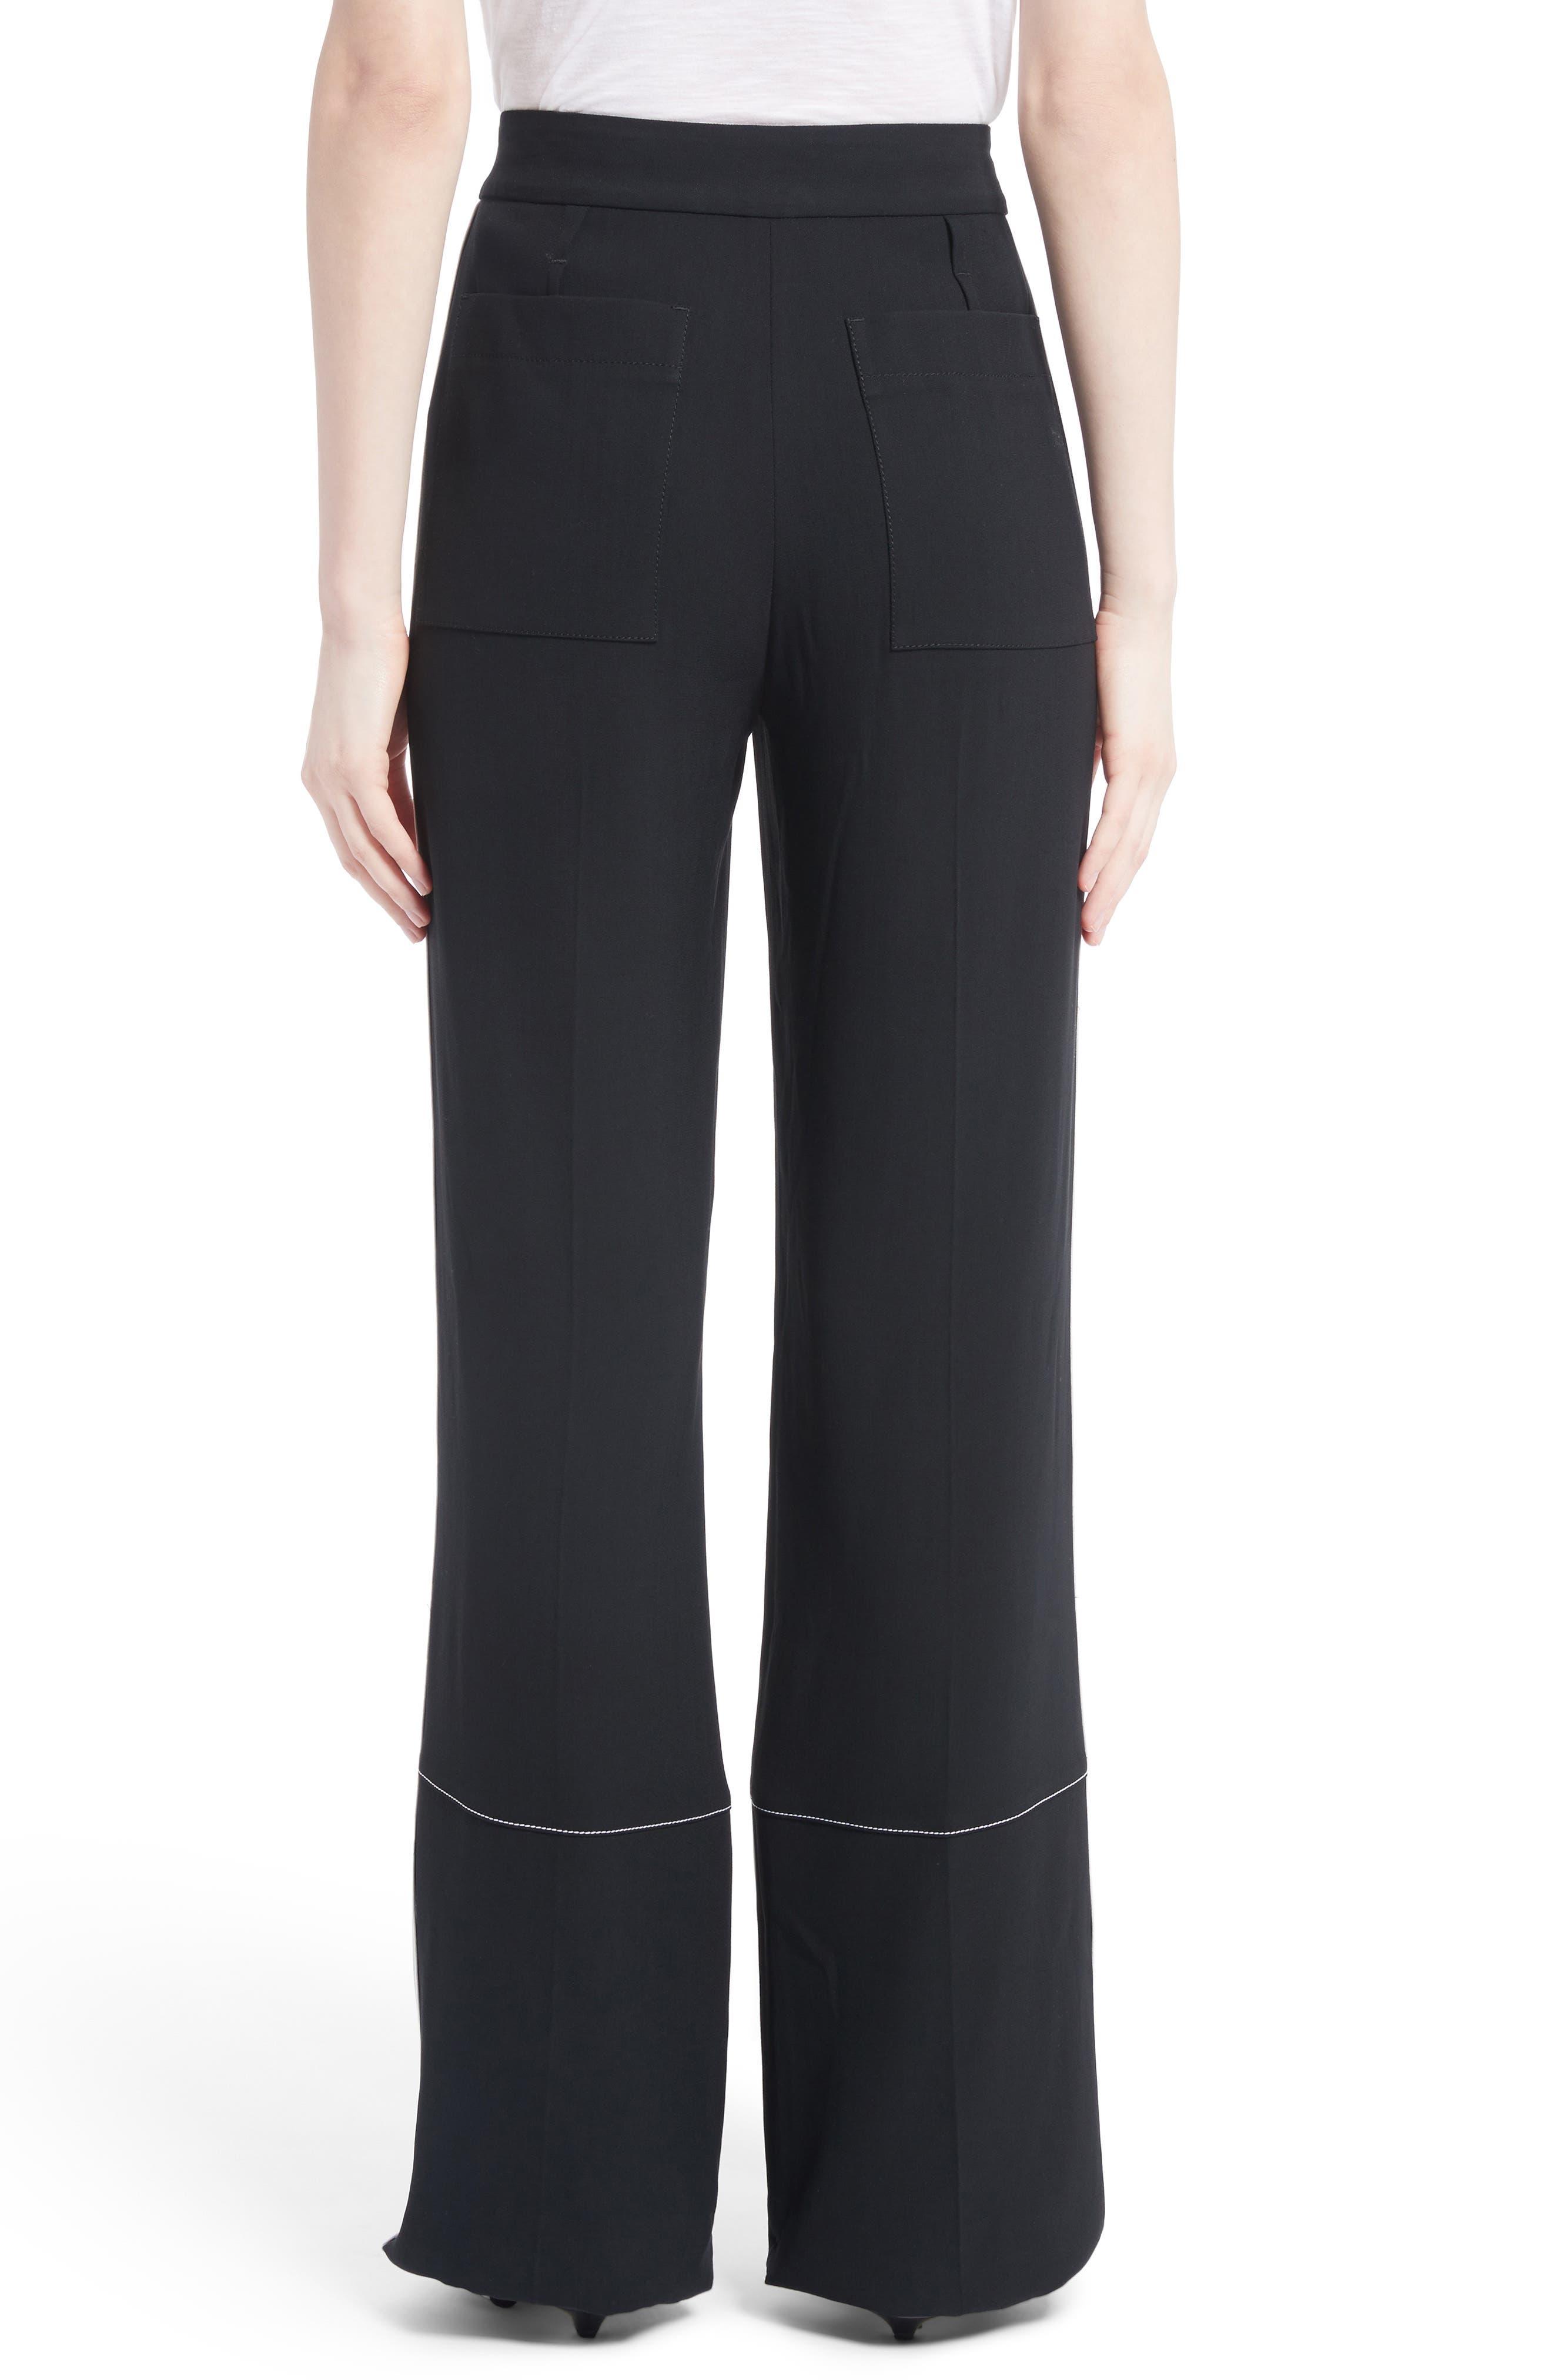 Proenza Schouler Woman Cotton-canvas Wide-leg Pants Forest Green Size 6 Proenza Schouler WkVWcj